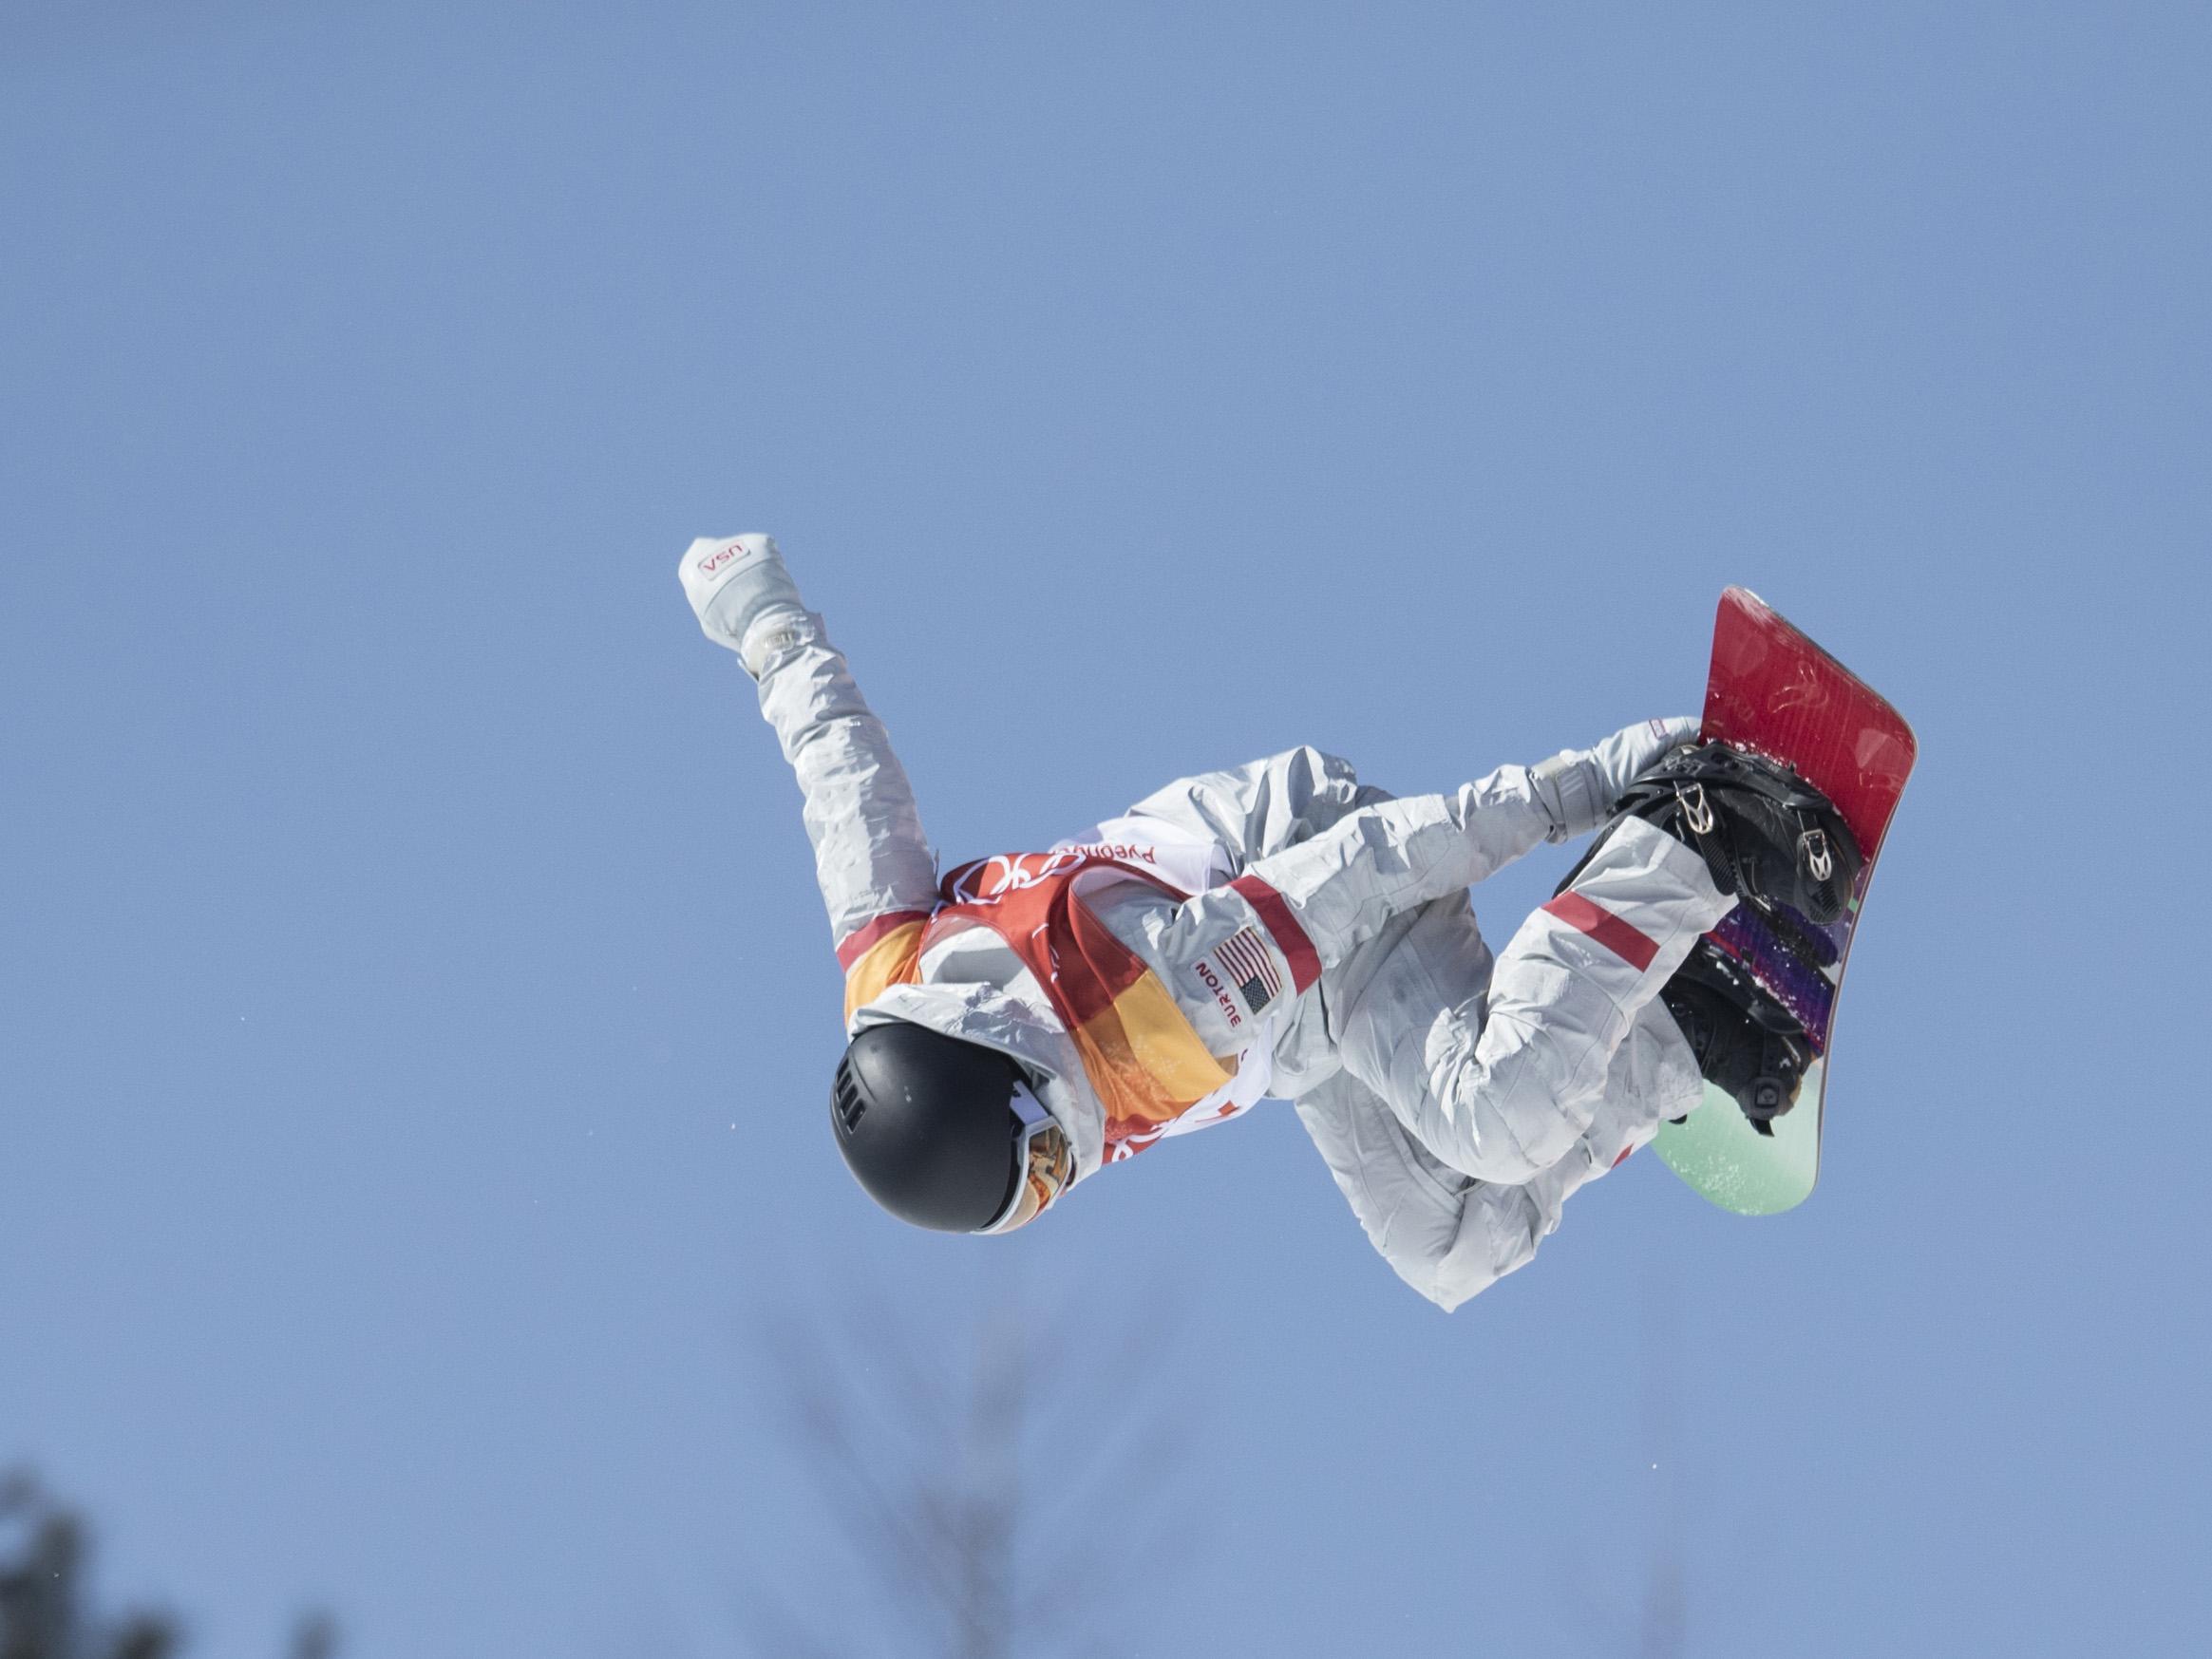 Snowboard – Winter Olympics Day 4